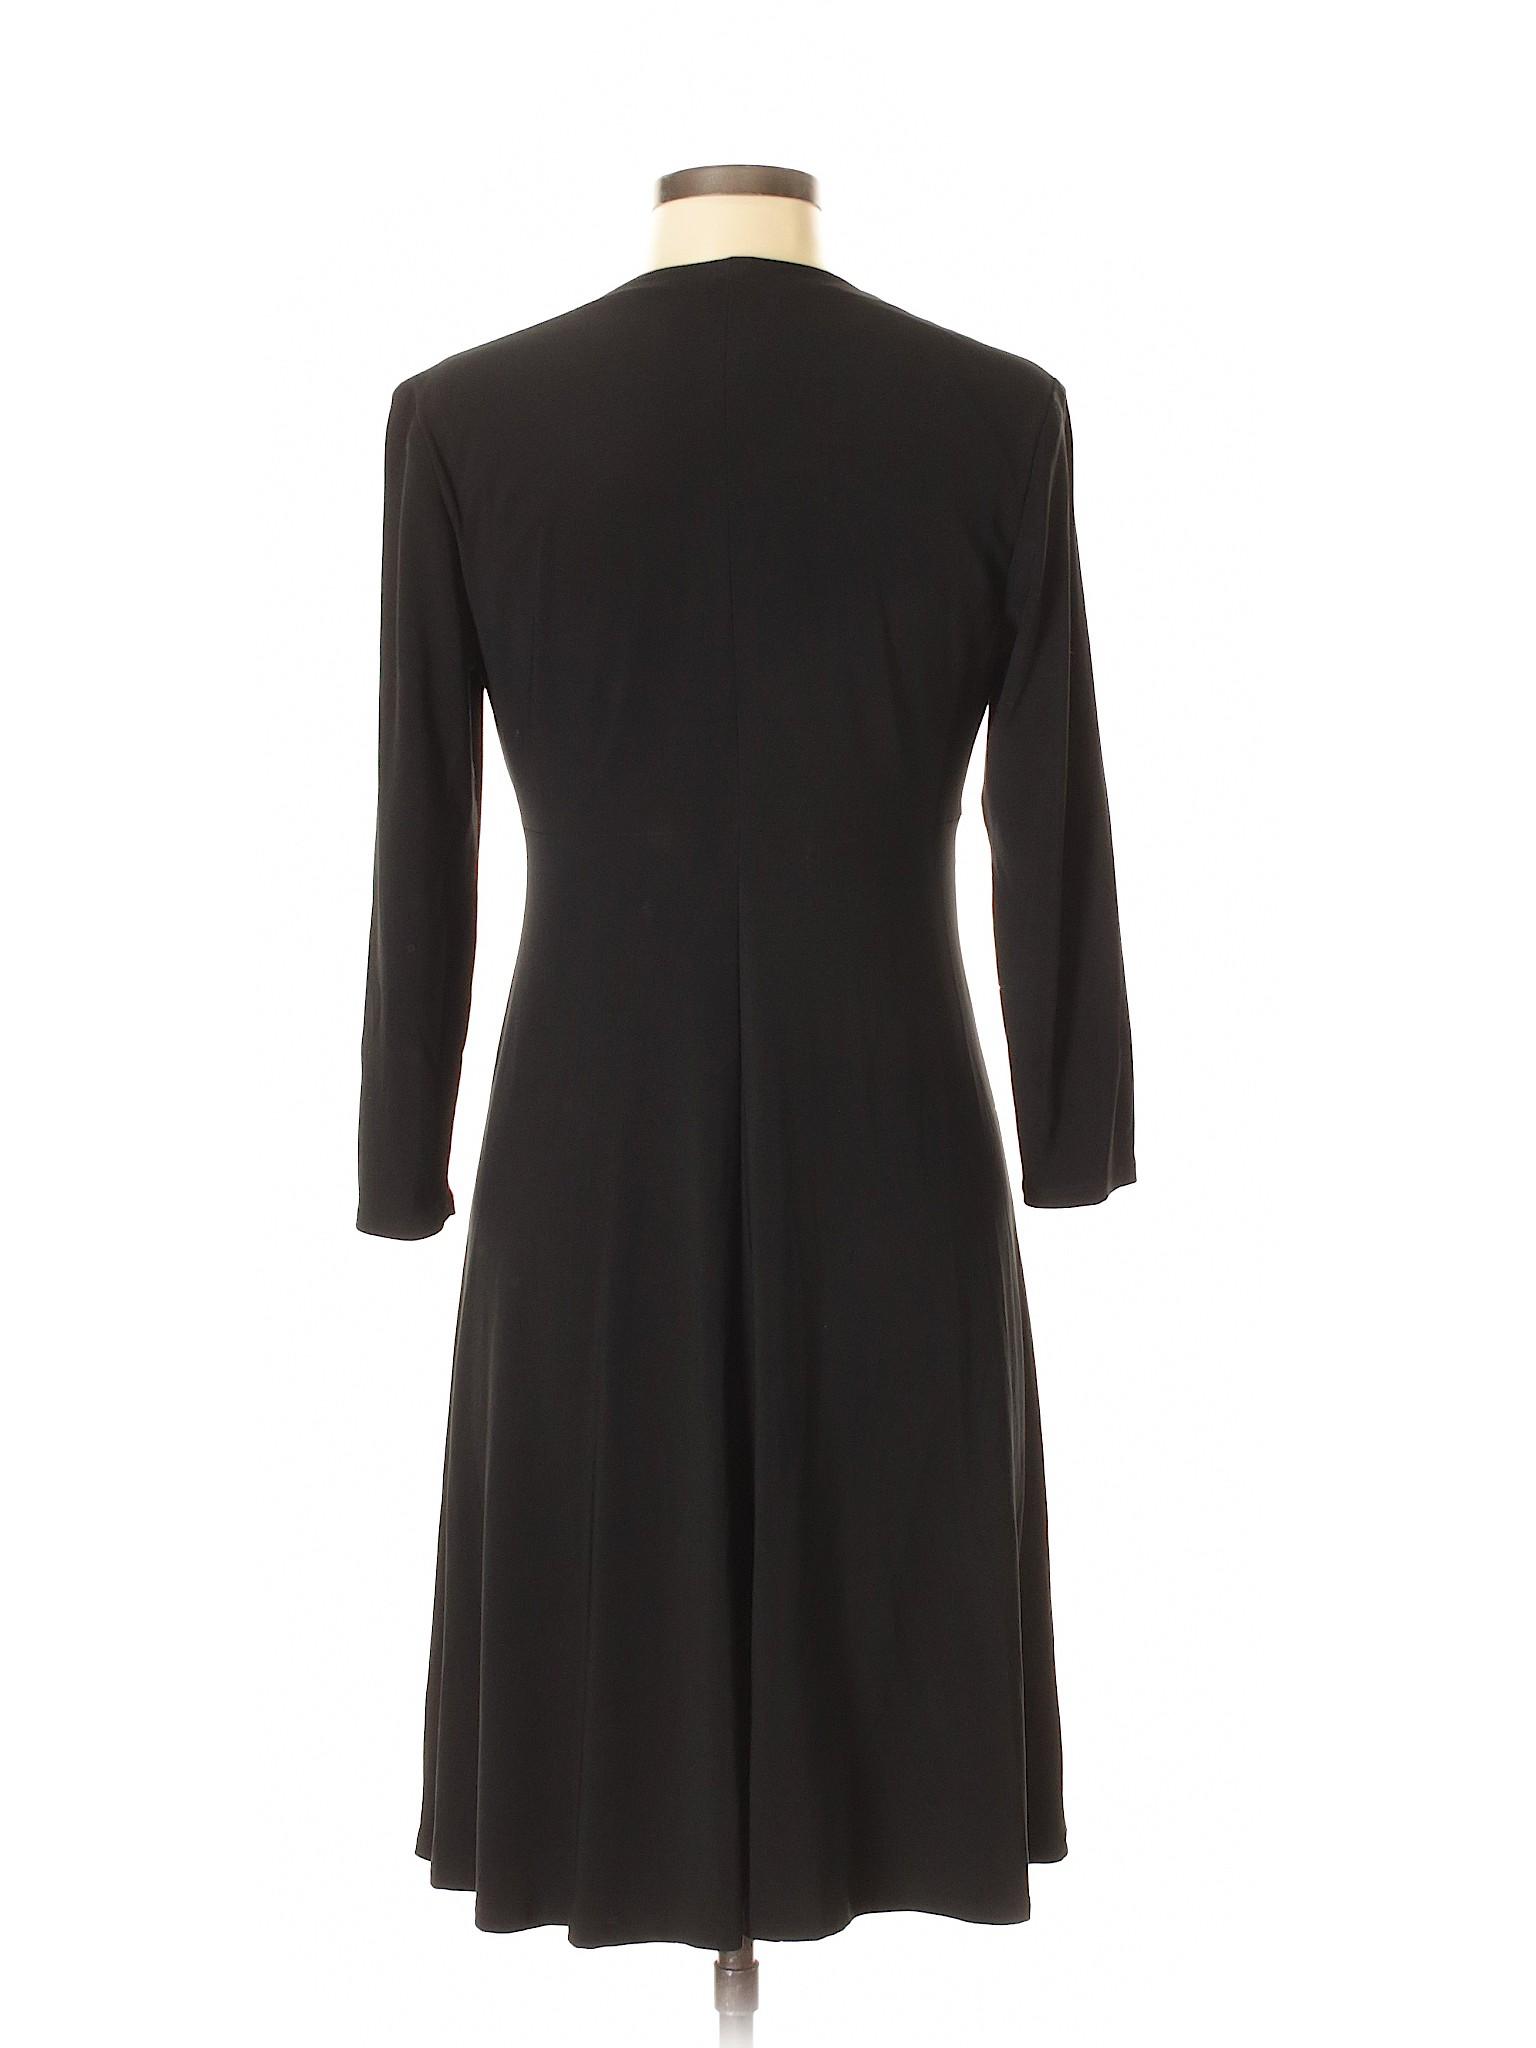 Casual Selling Picone Selling Dress Evan Evan xz6PI